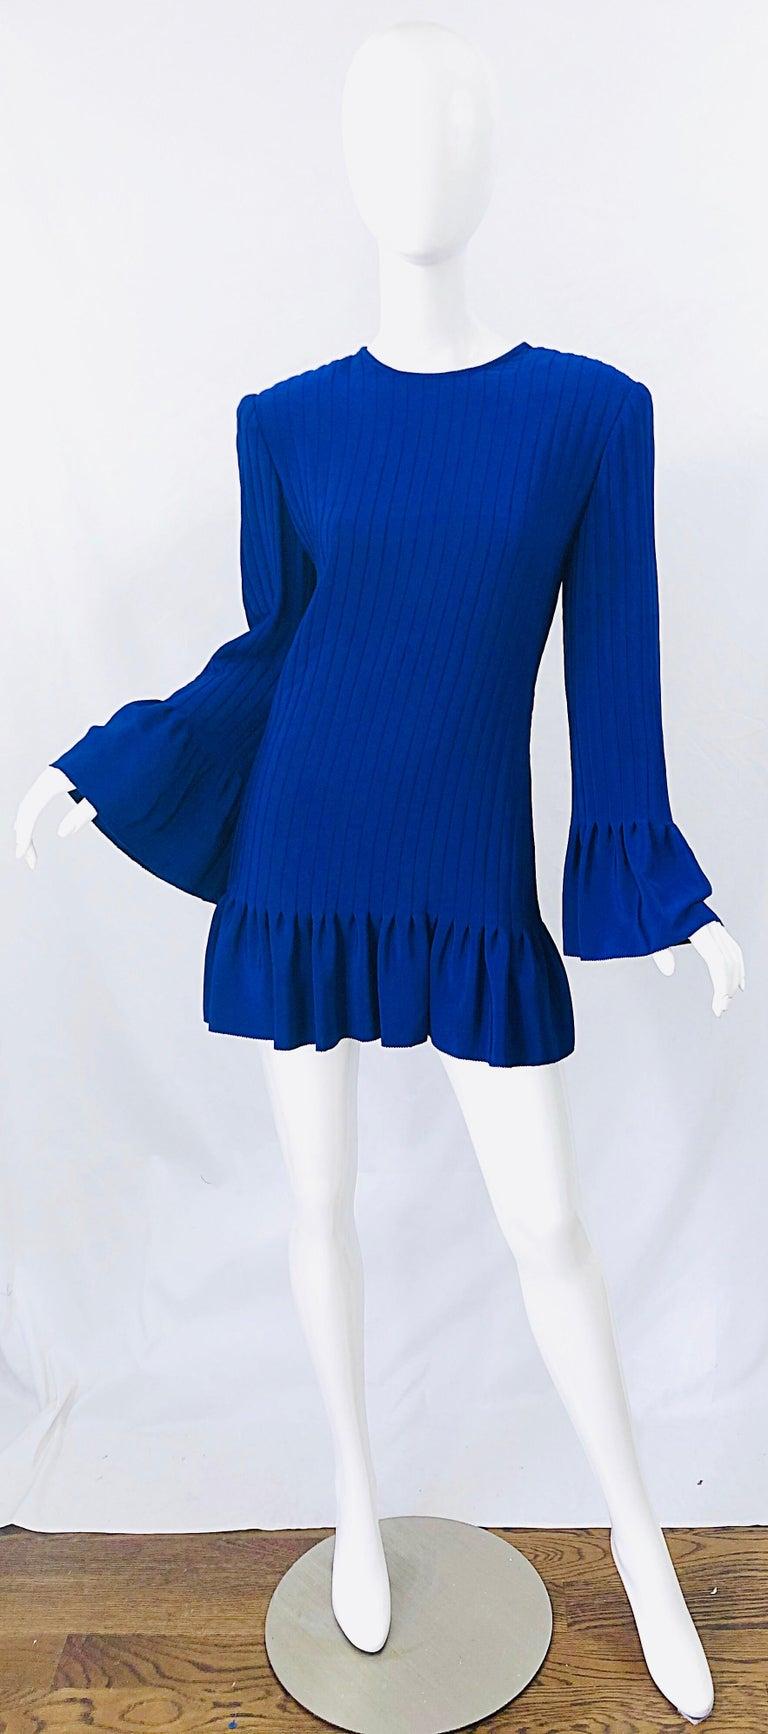 Vintage Tarquin Ebker Royal Blue 1980s Silk Pleated 80s Mini Dress Tunic Shirt For Sale 11